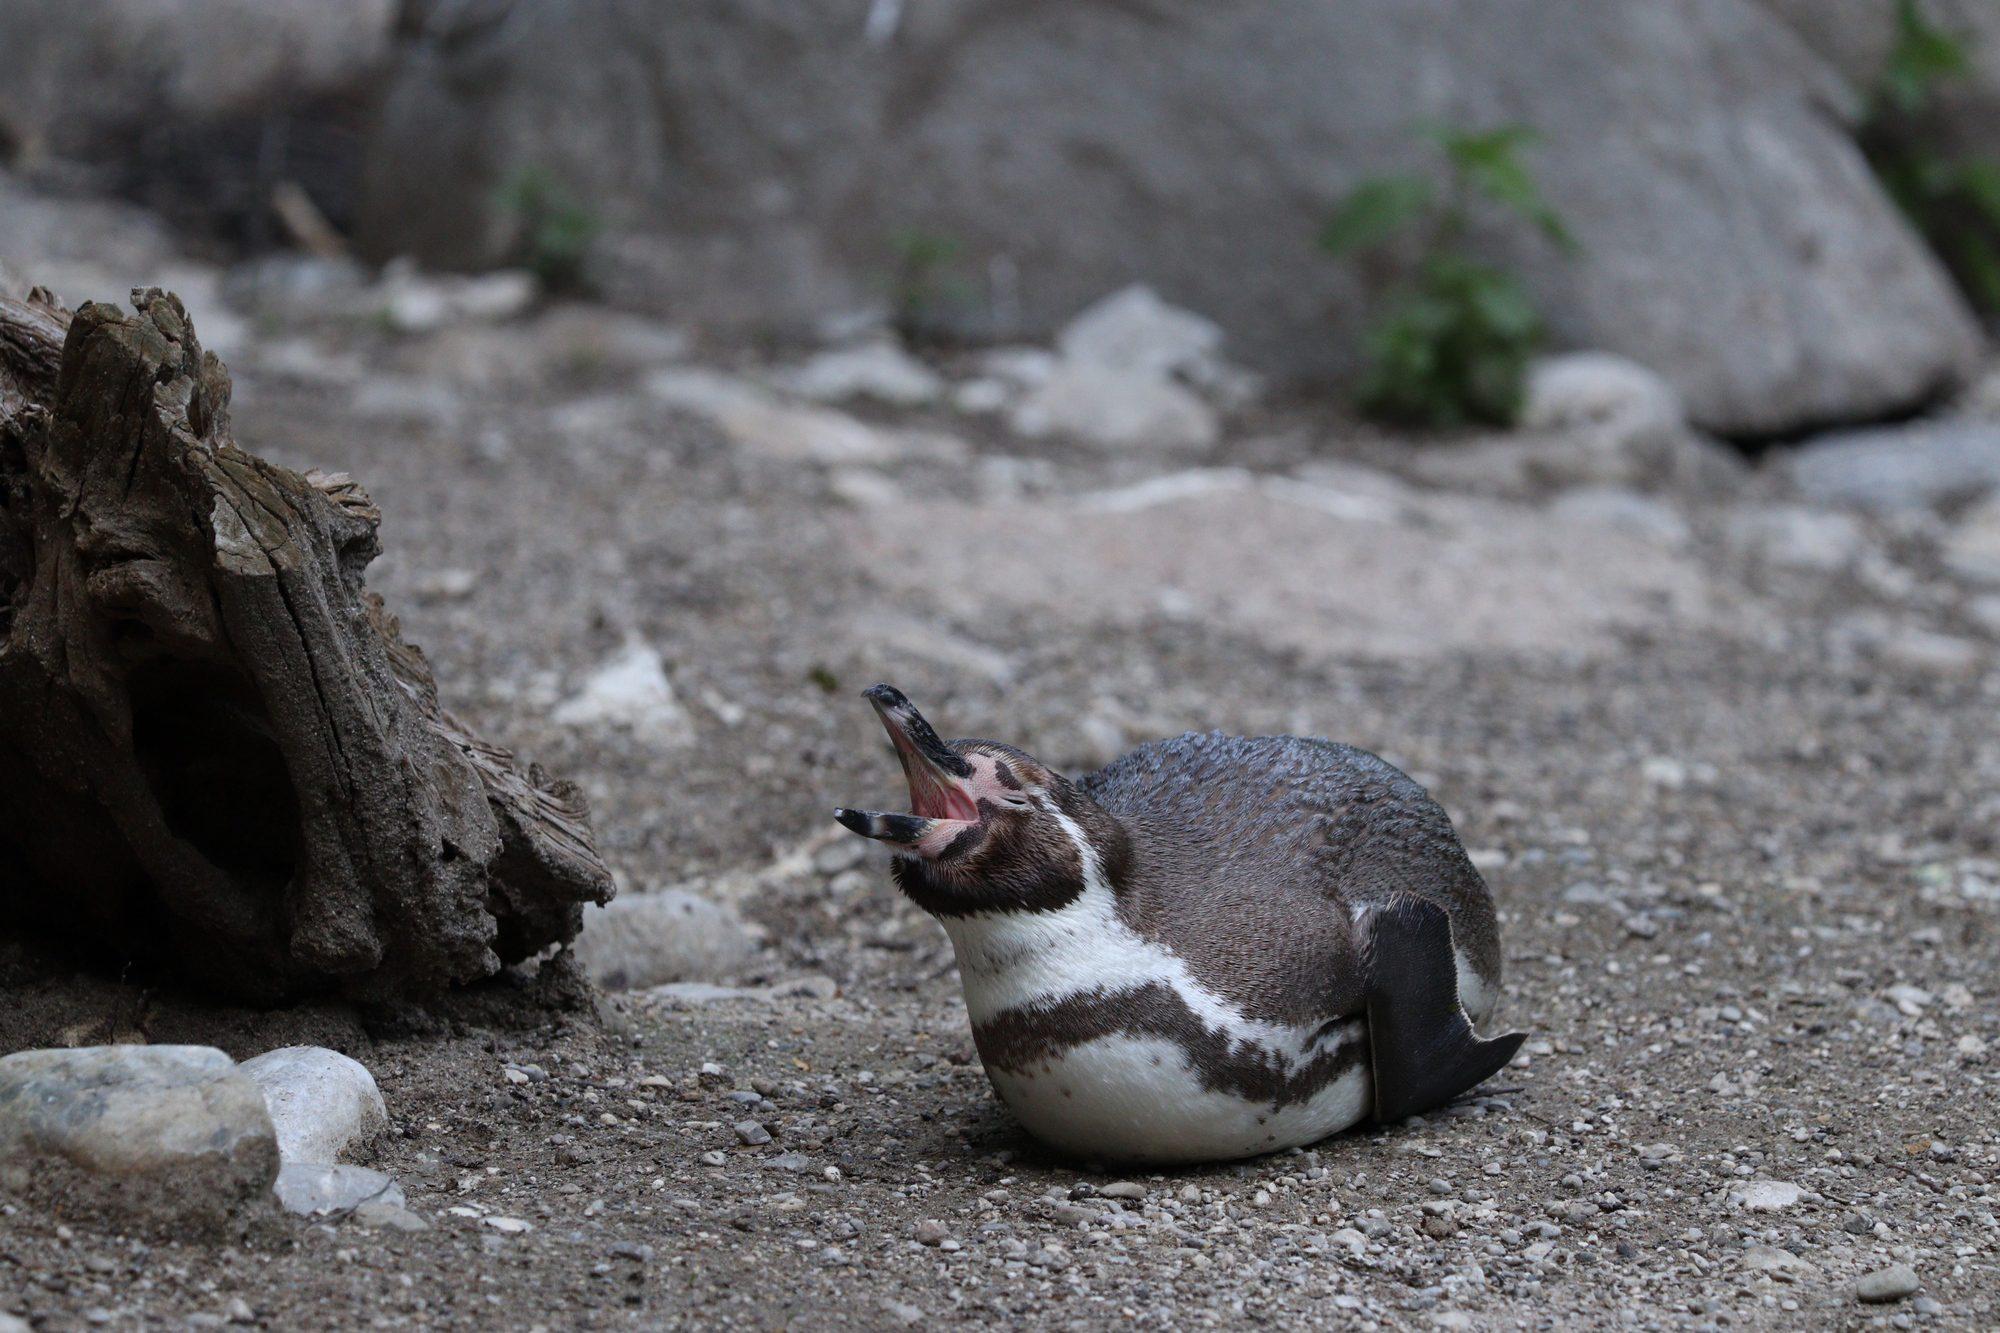 Humboltpinguin im Tierpark Hellabrunn